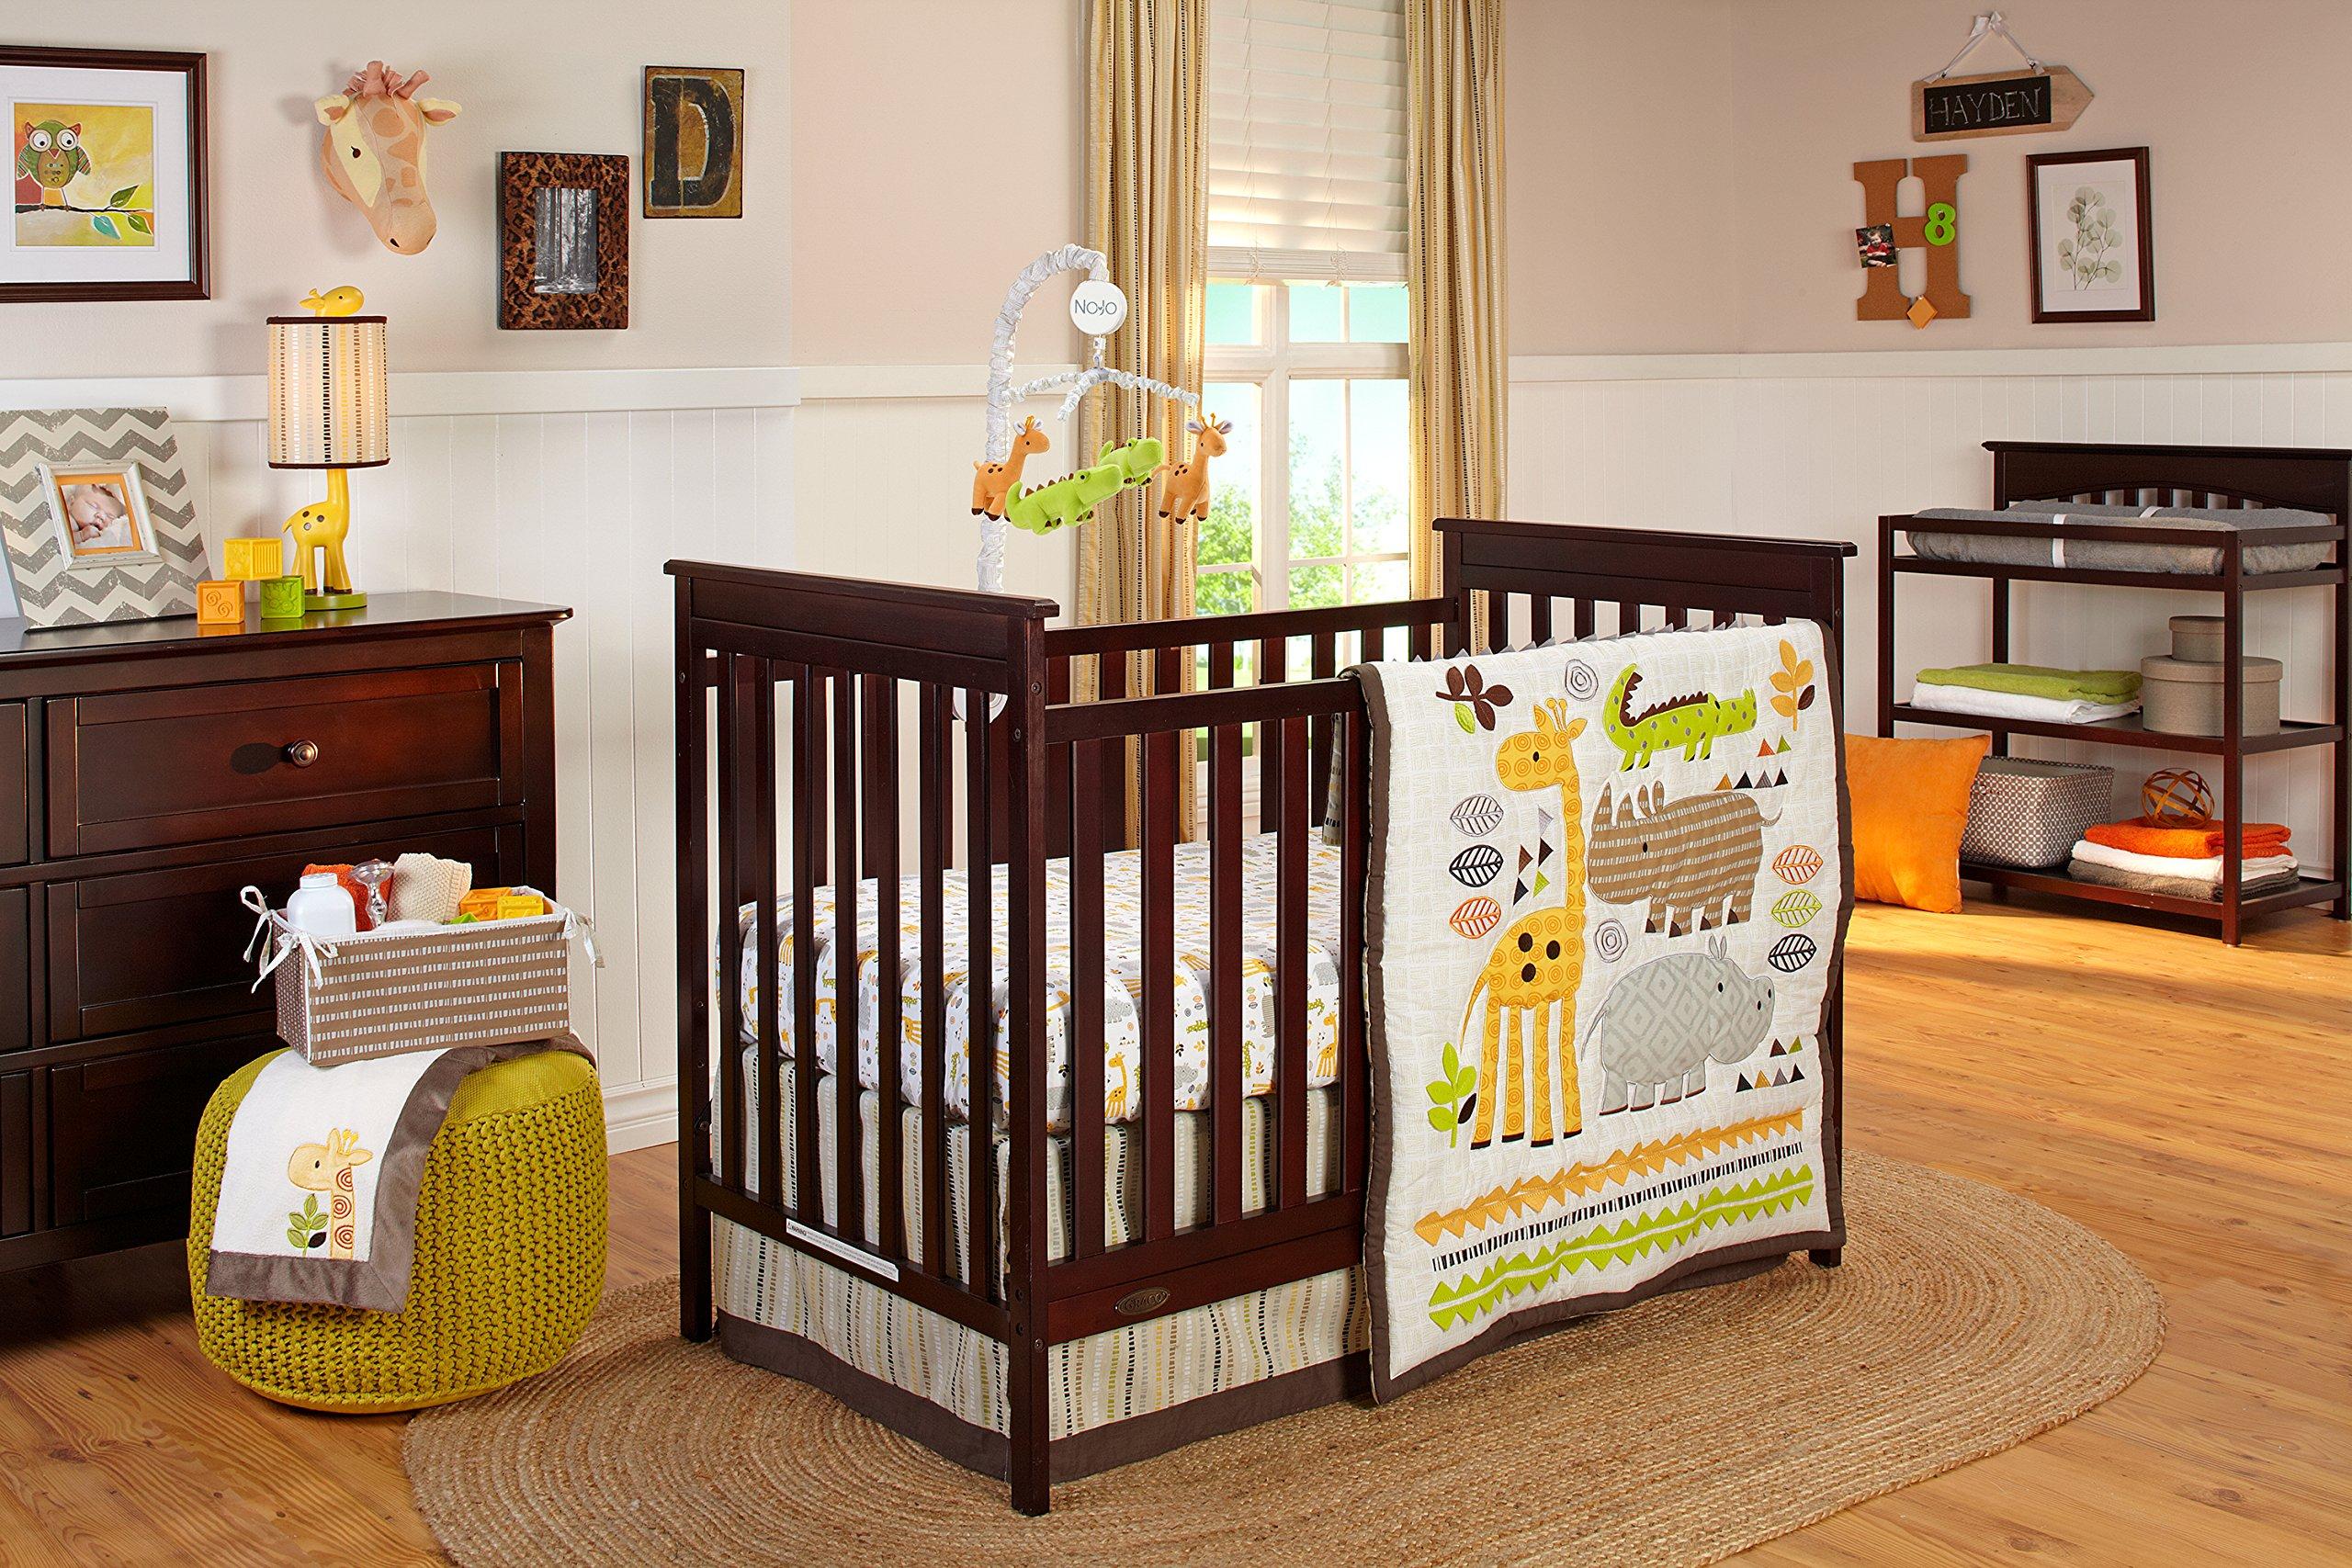 NoJo Zoobilee Crib Bedding Set, 4 Count